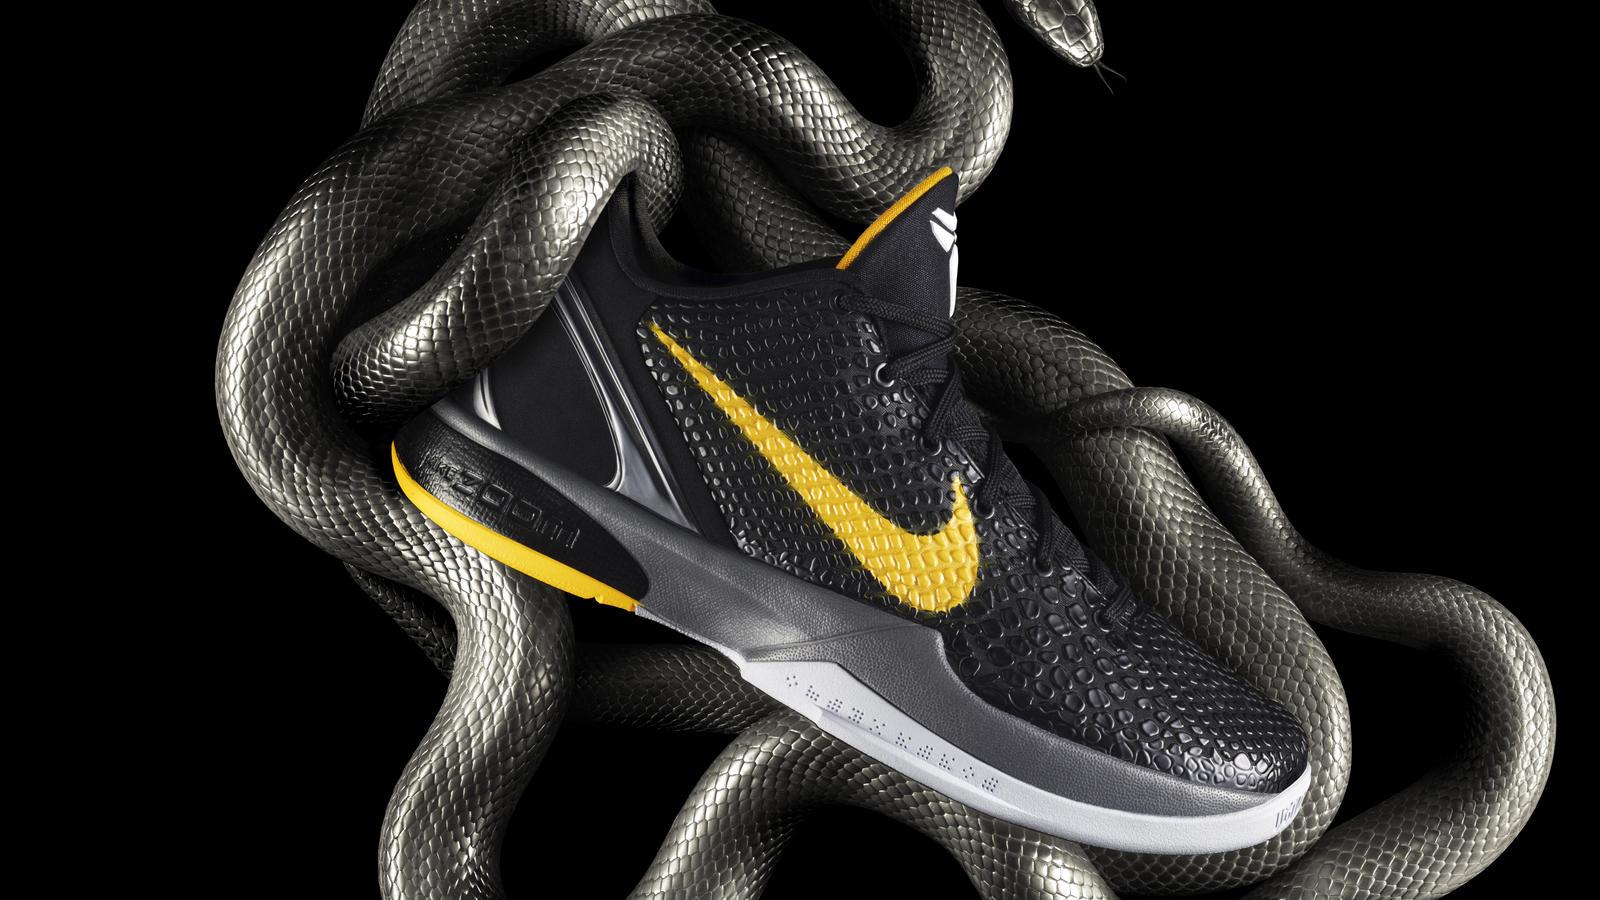 Nike Zoom Kobe VI Black Mamba bk hd 1600